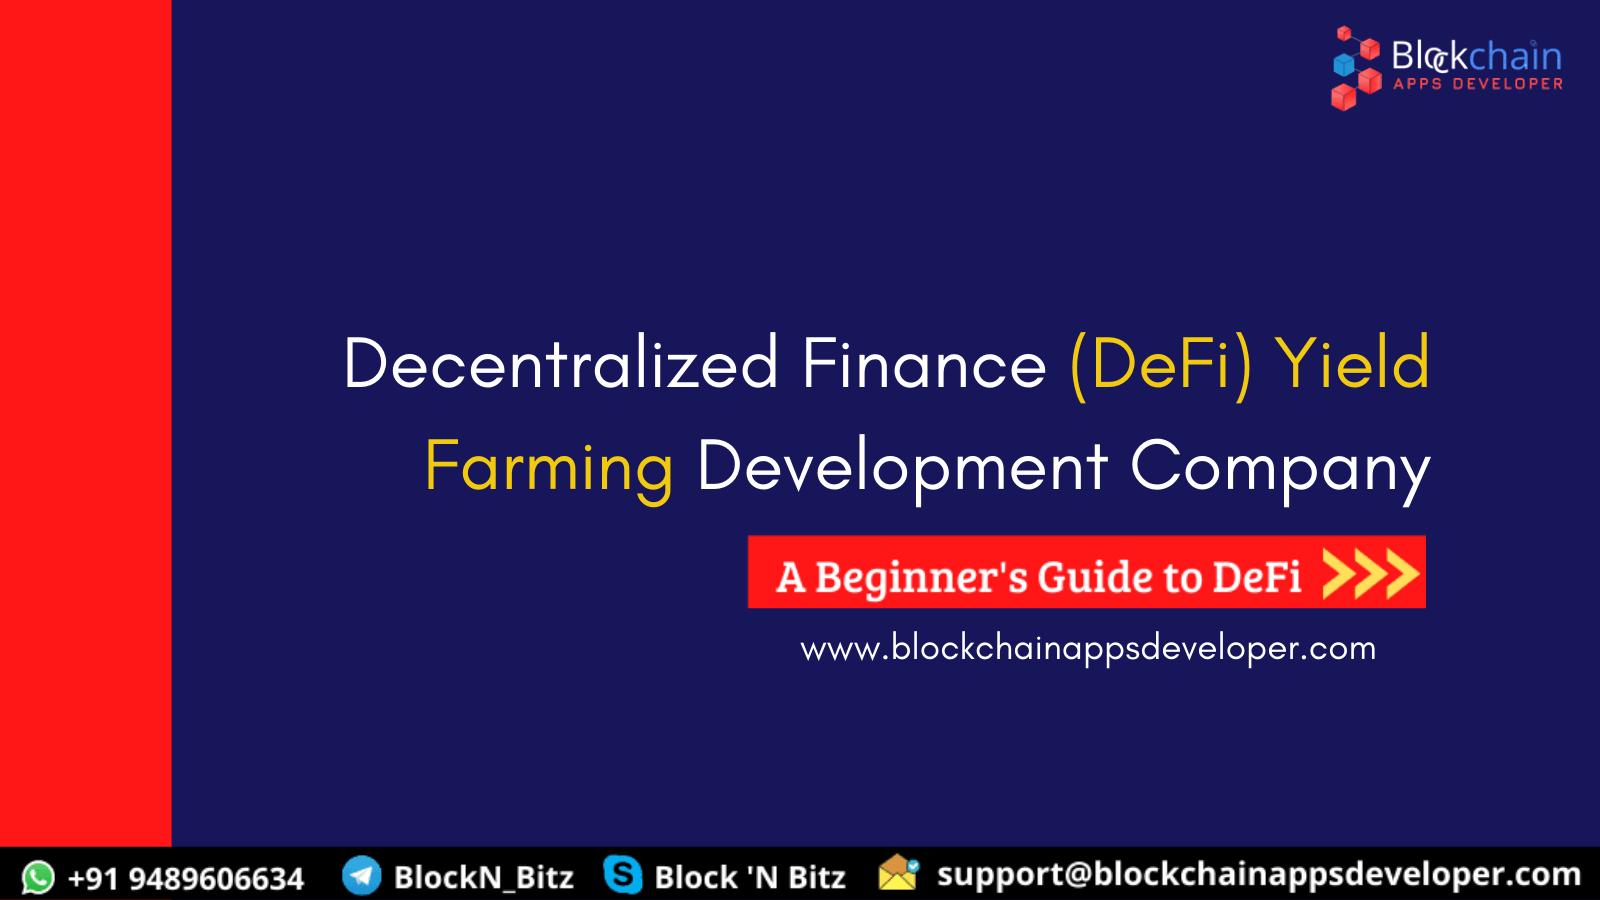 DeFi Yield Farming Development Services Company